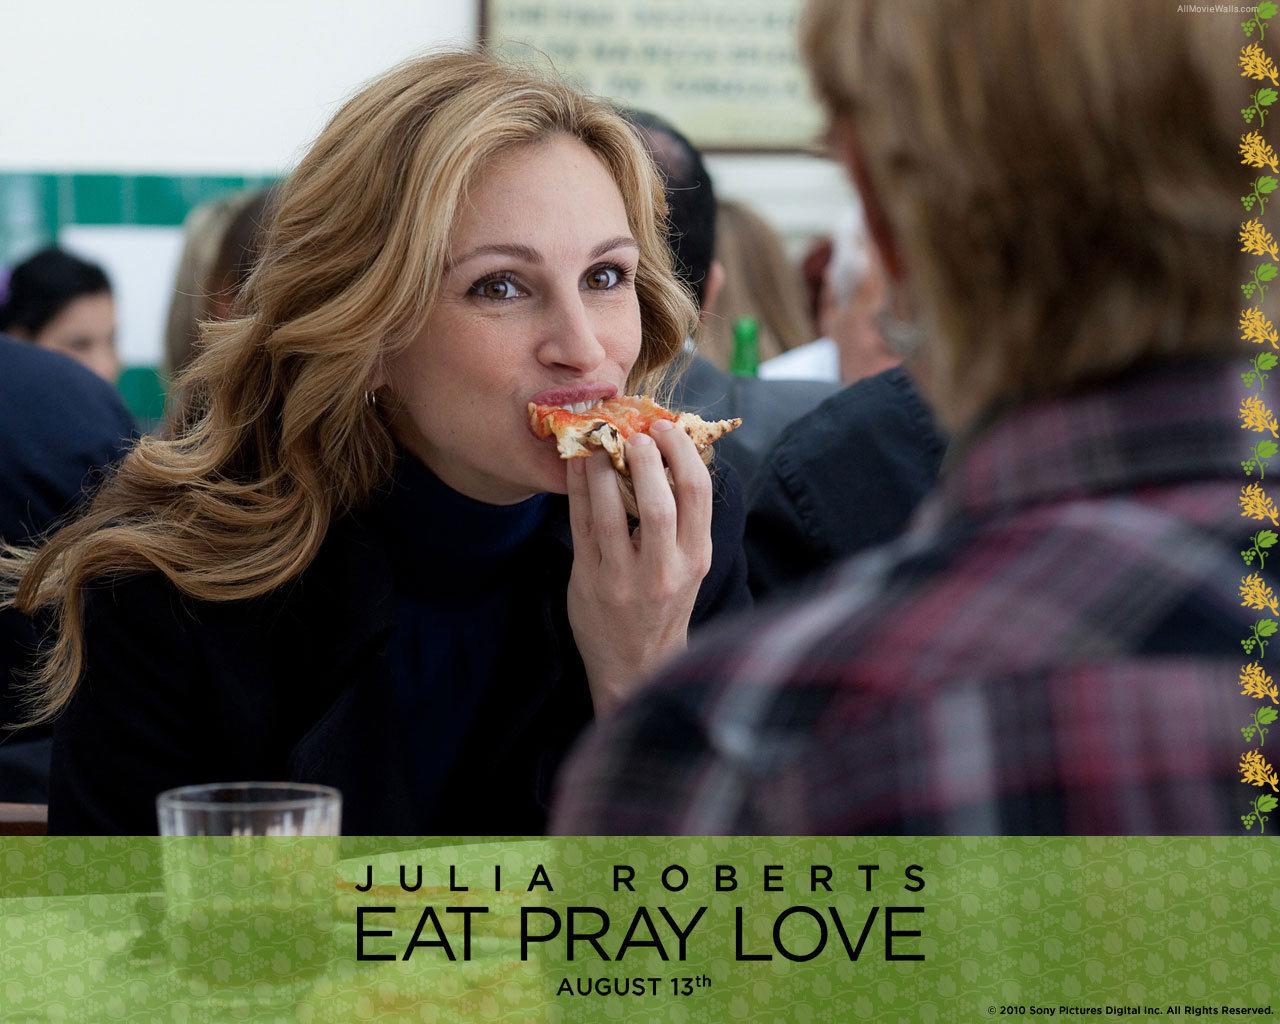 Love Wallpaper Movie : Eat Pray Love Wallpaper - Movies Wallpaper (14451726) - Fanpop